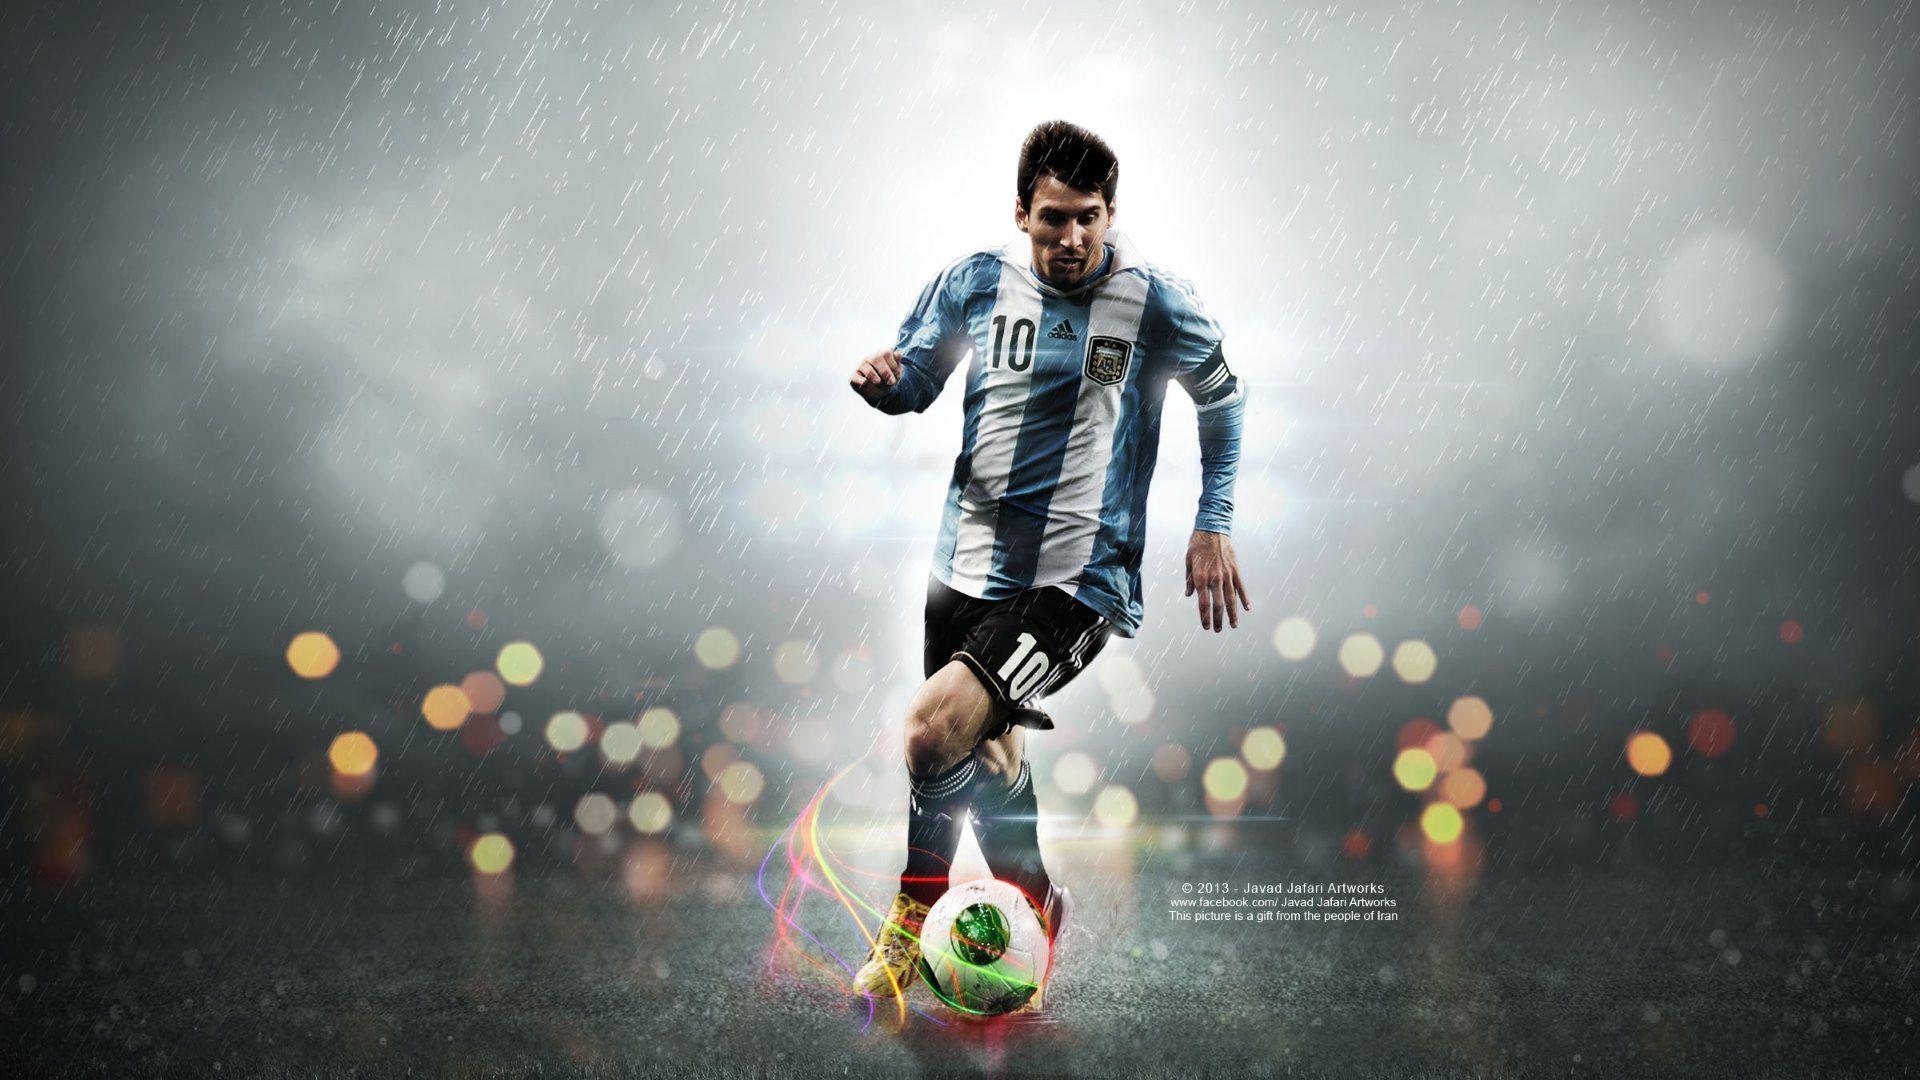 Hd Wallpapers Messi Best Wallpaper Hd Lionel Messi Wallpapers Lionel Messi Lionel Messi Barcelona